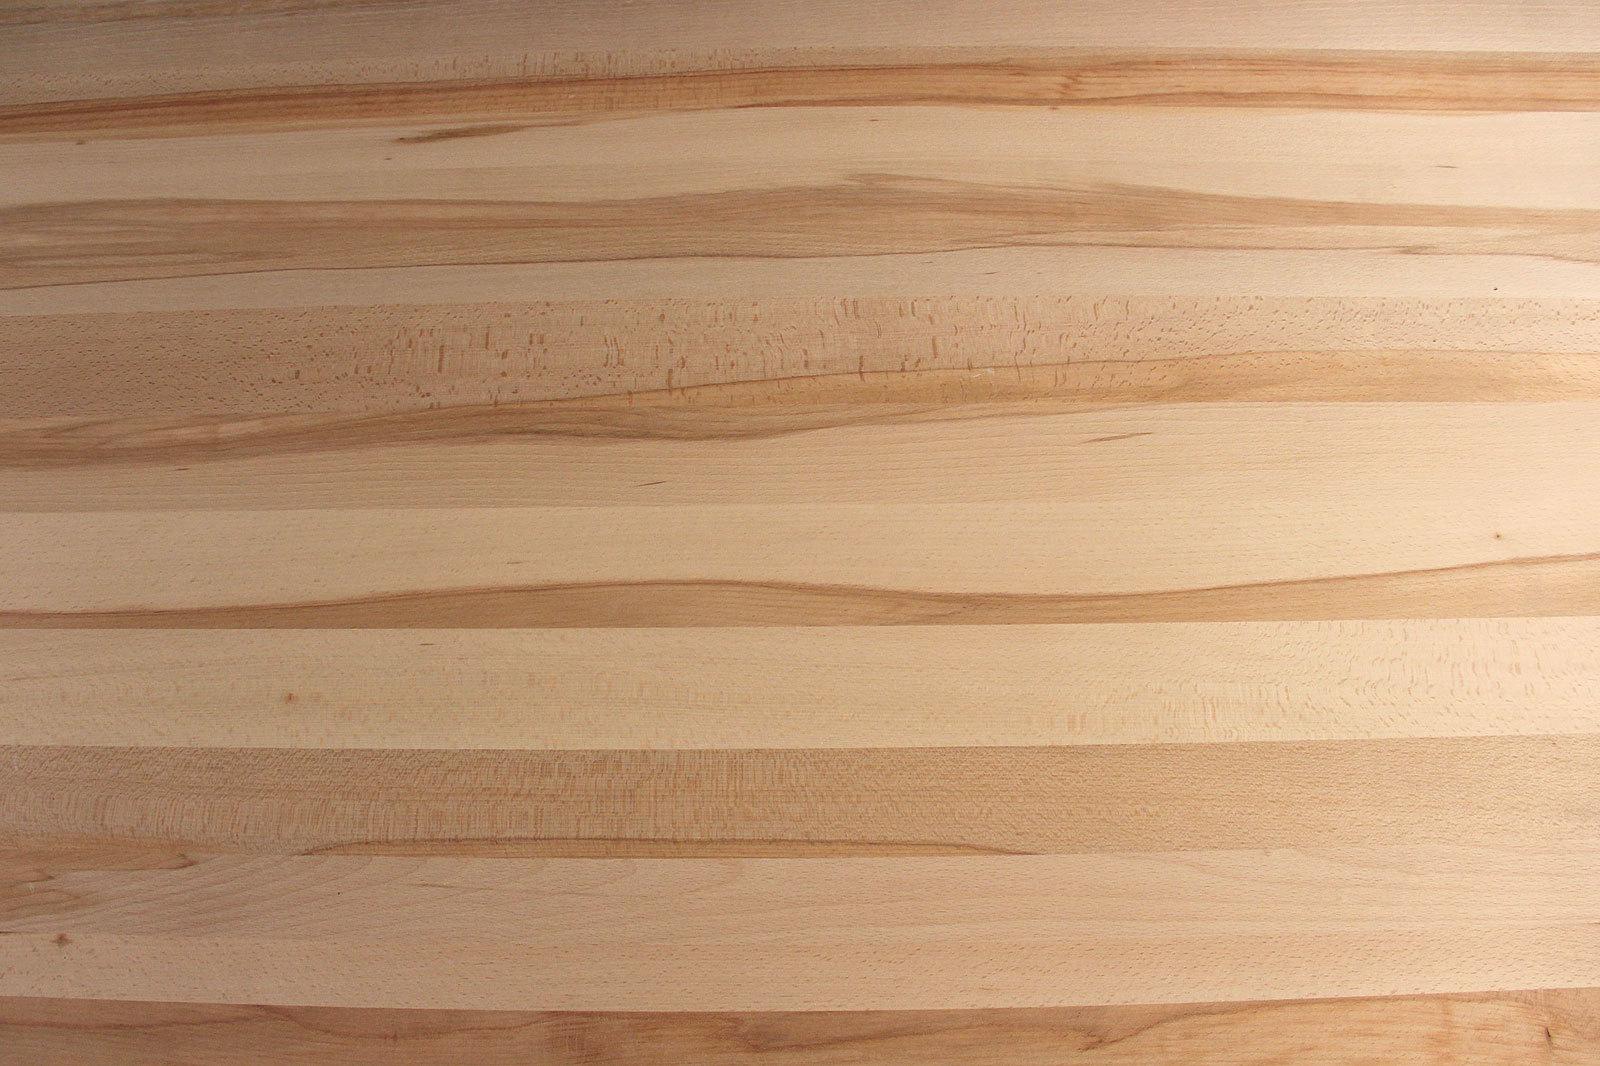 k che k chenarbeitsplatte bambus k chenarbeitsplatte. Black Bedroom Furniture Sets. Home Design Ideas